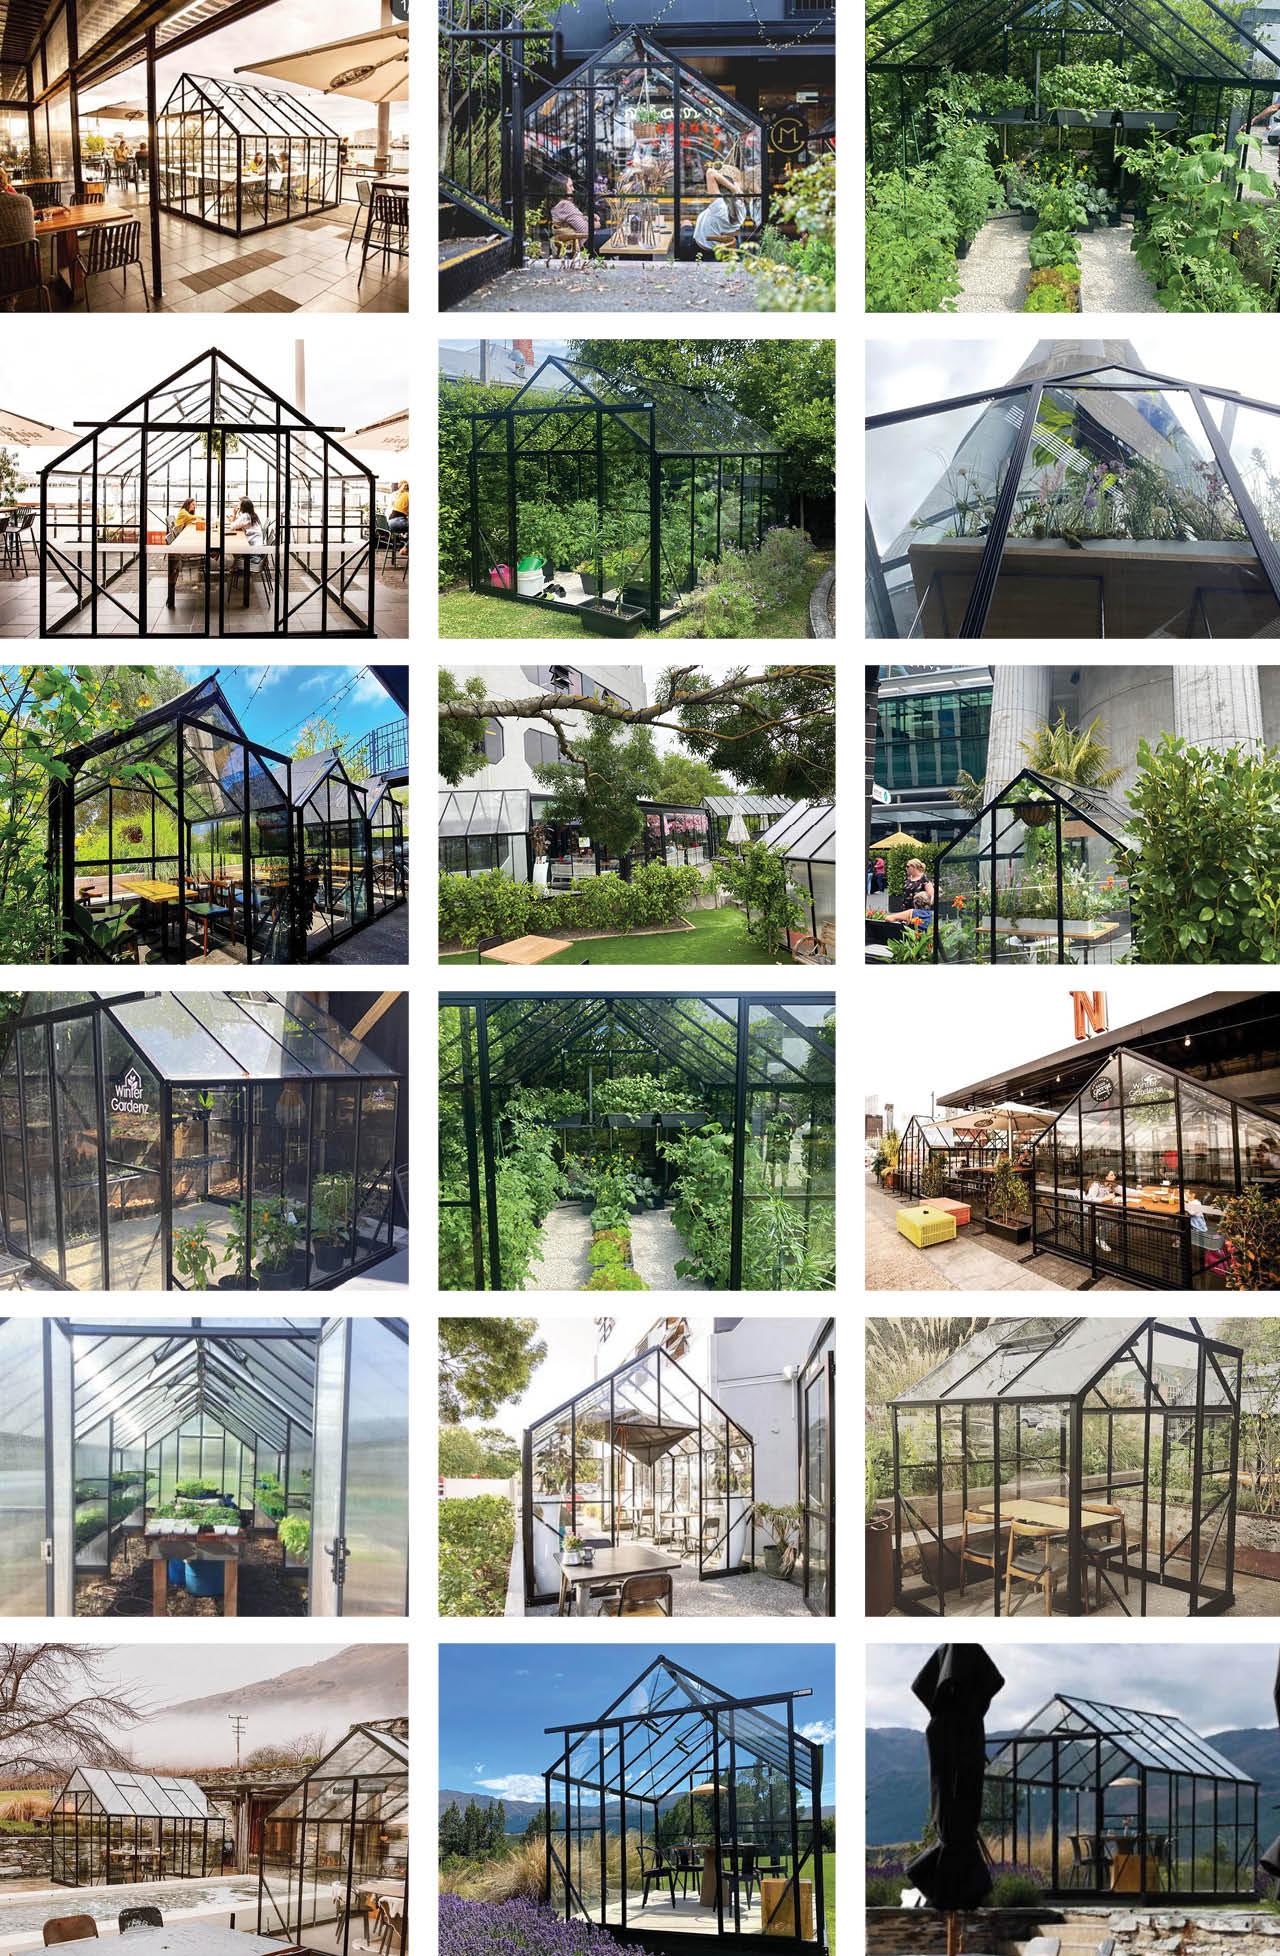 winter-gardenz-residential-gallery-pg1.jpg